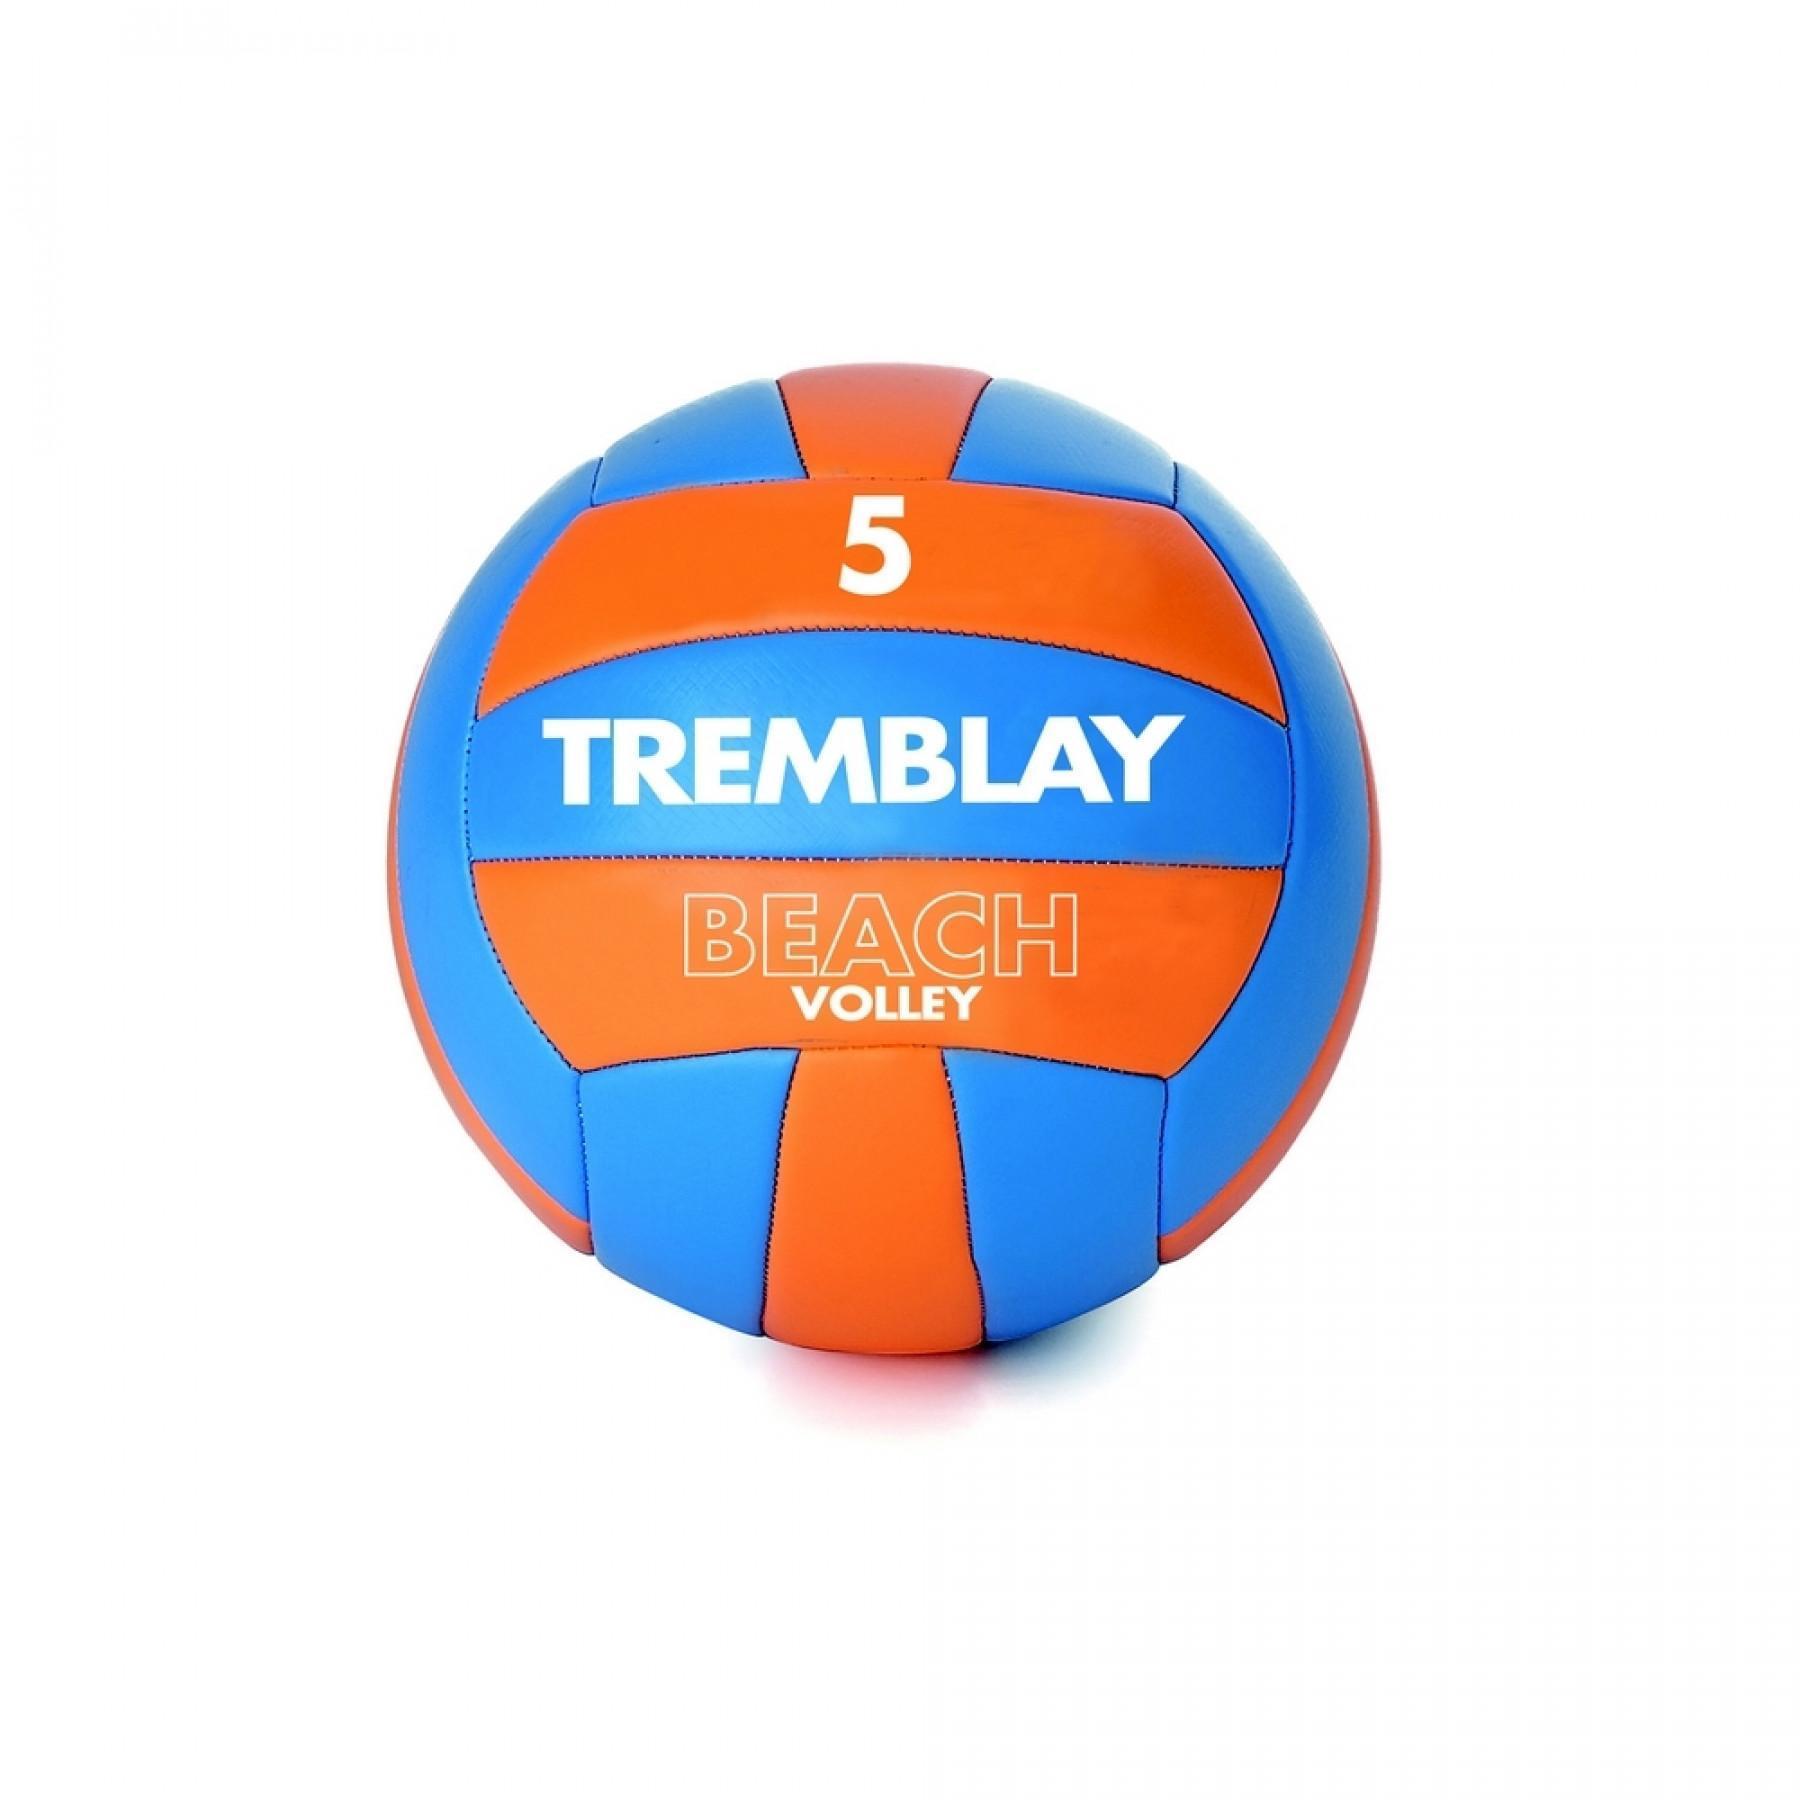 Tremblay beach volleyball